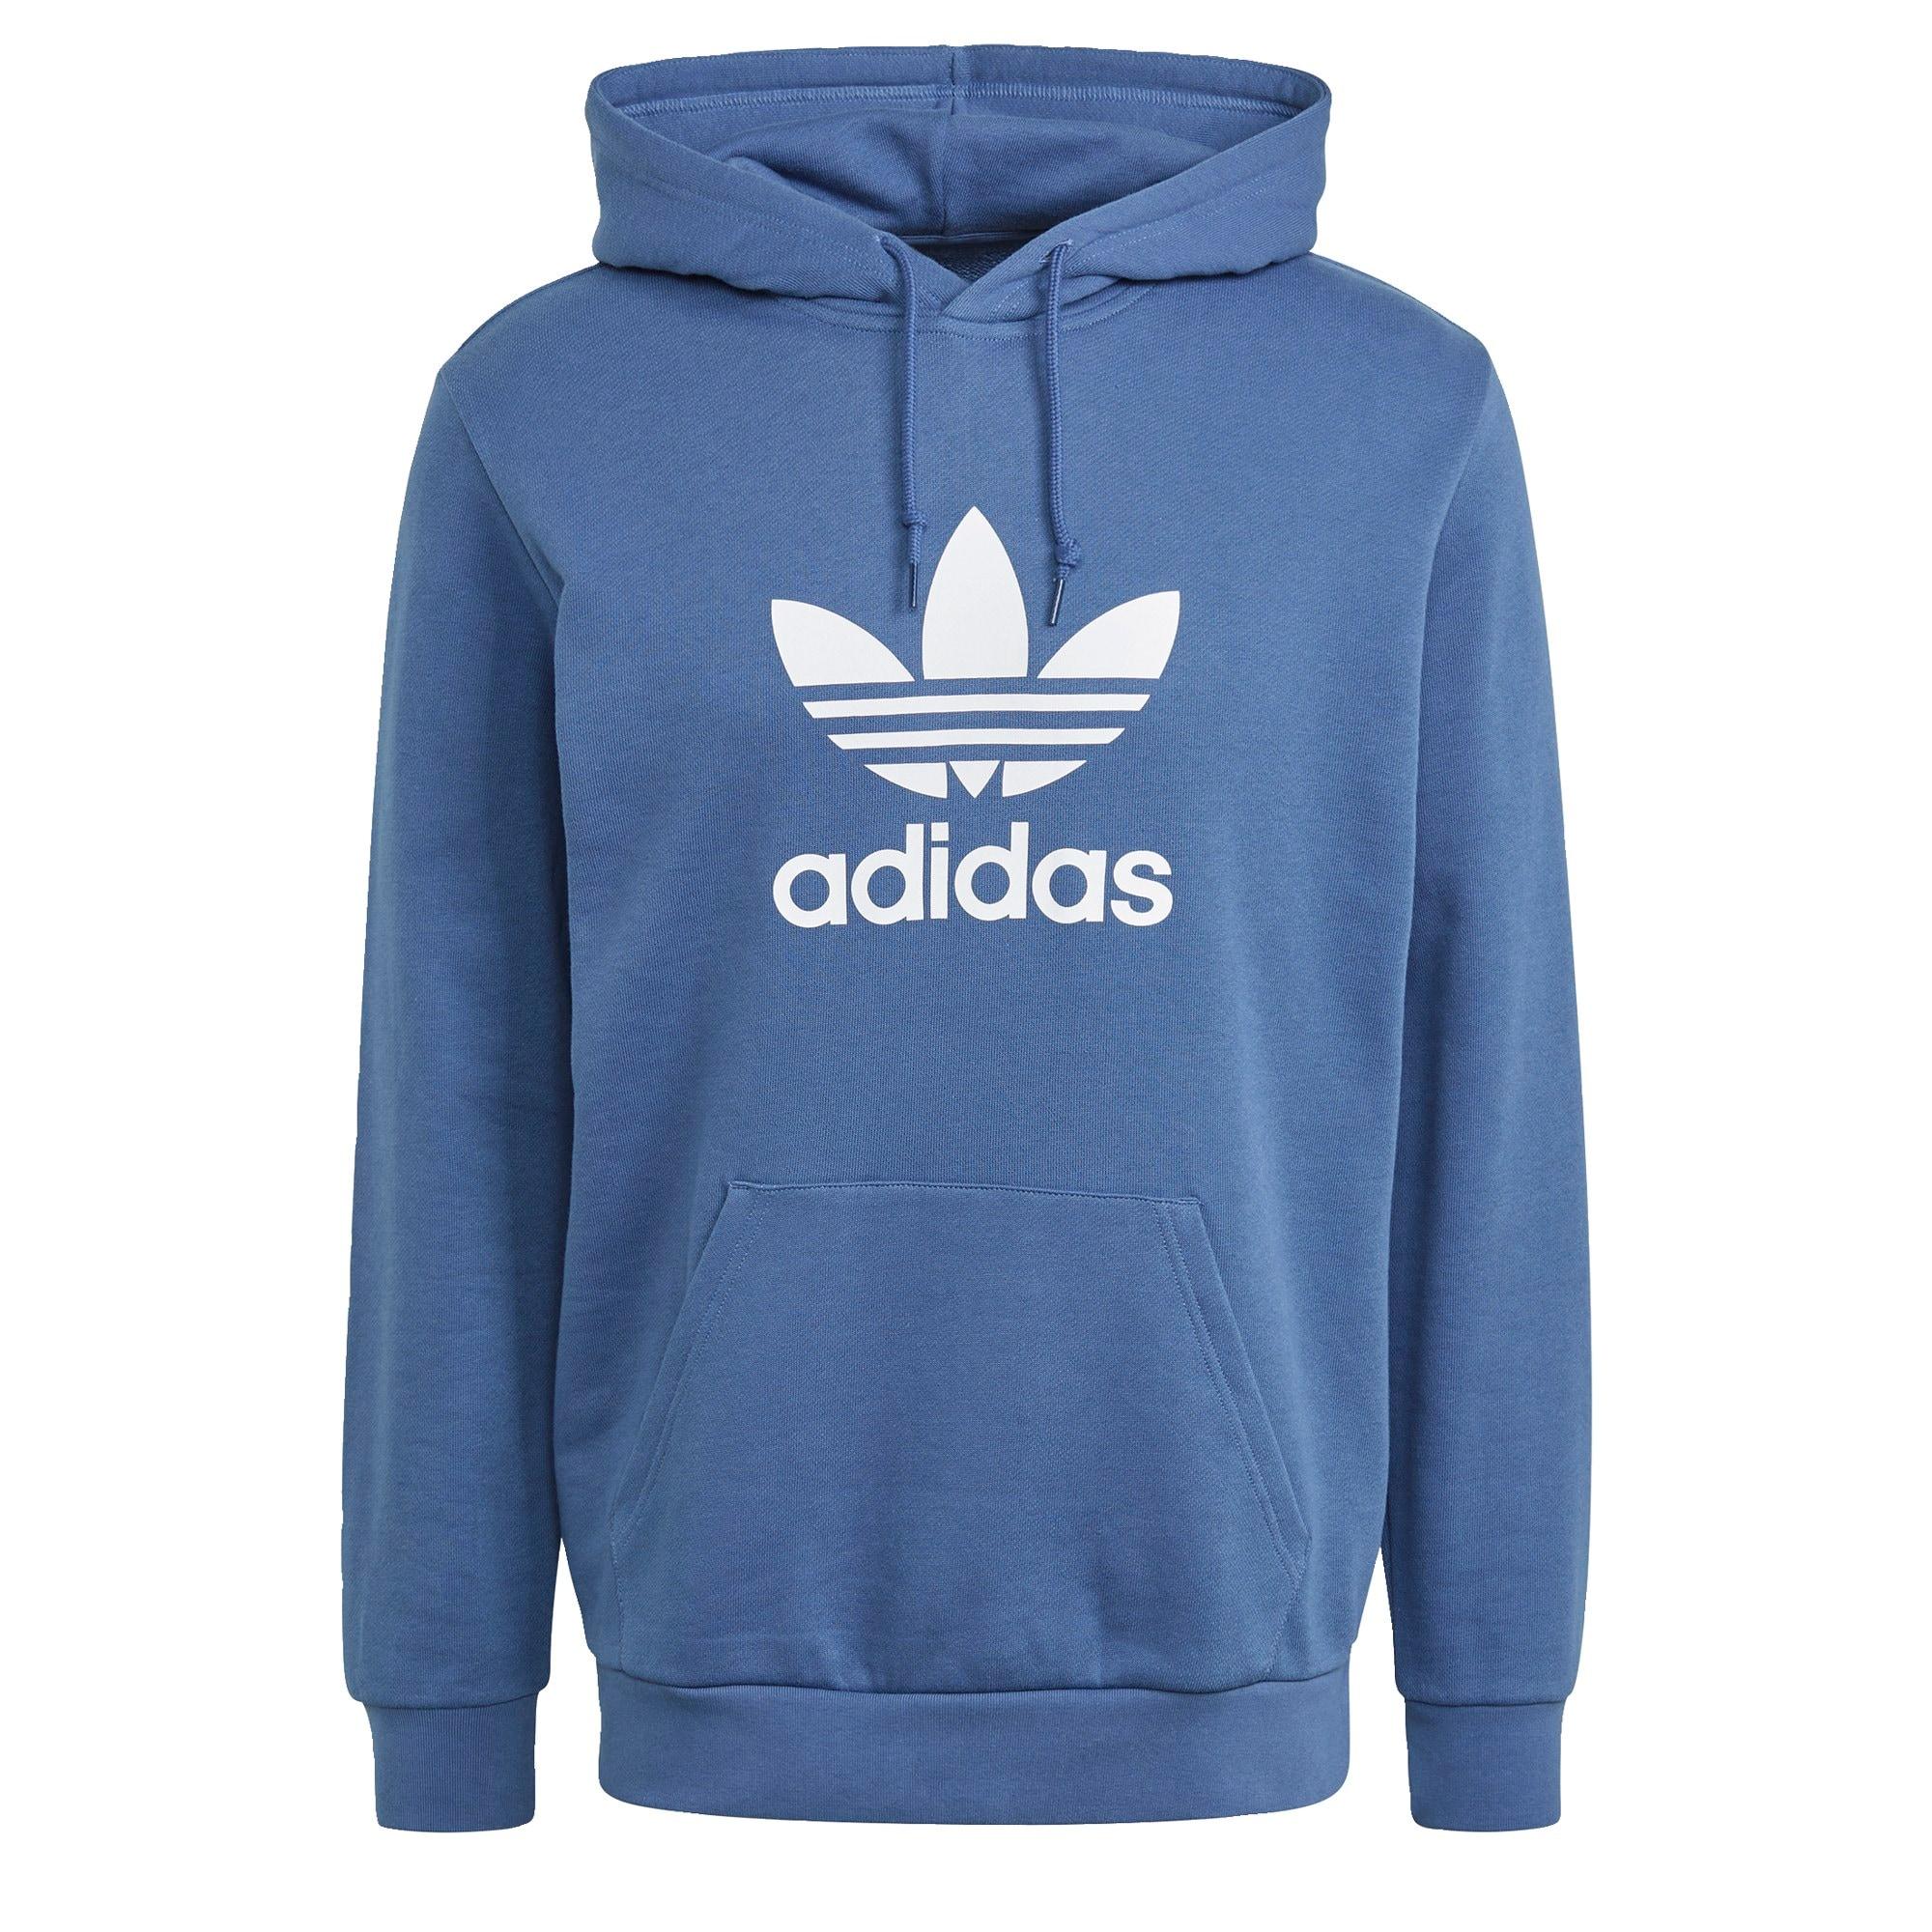 ADIDAS ORIGINALS Megztinis be užsegimo balta / mėlyna dūmų spalva